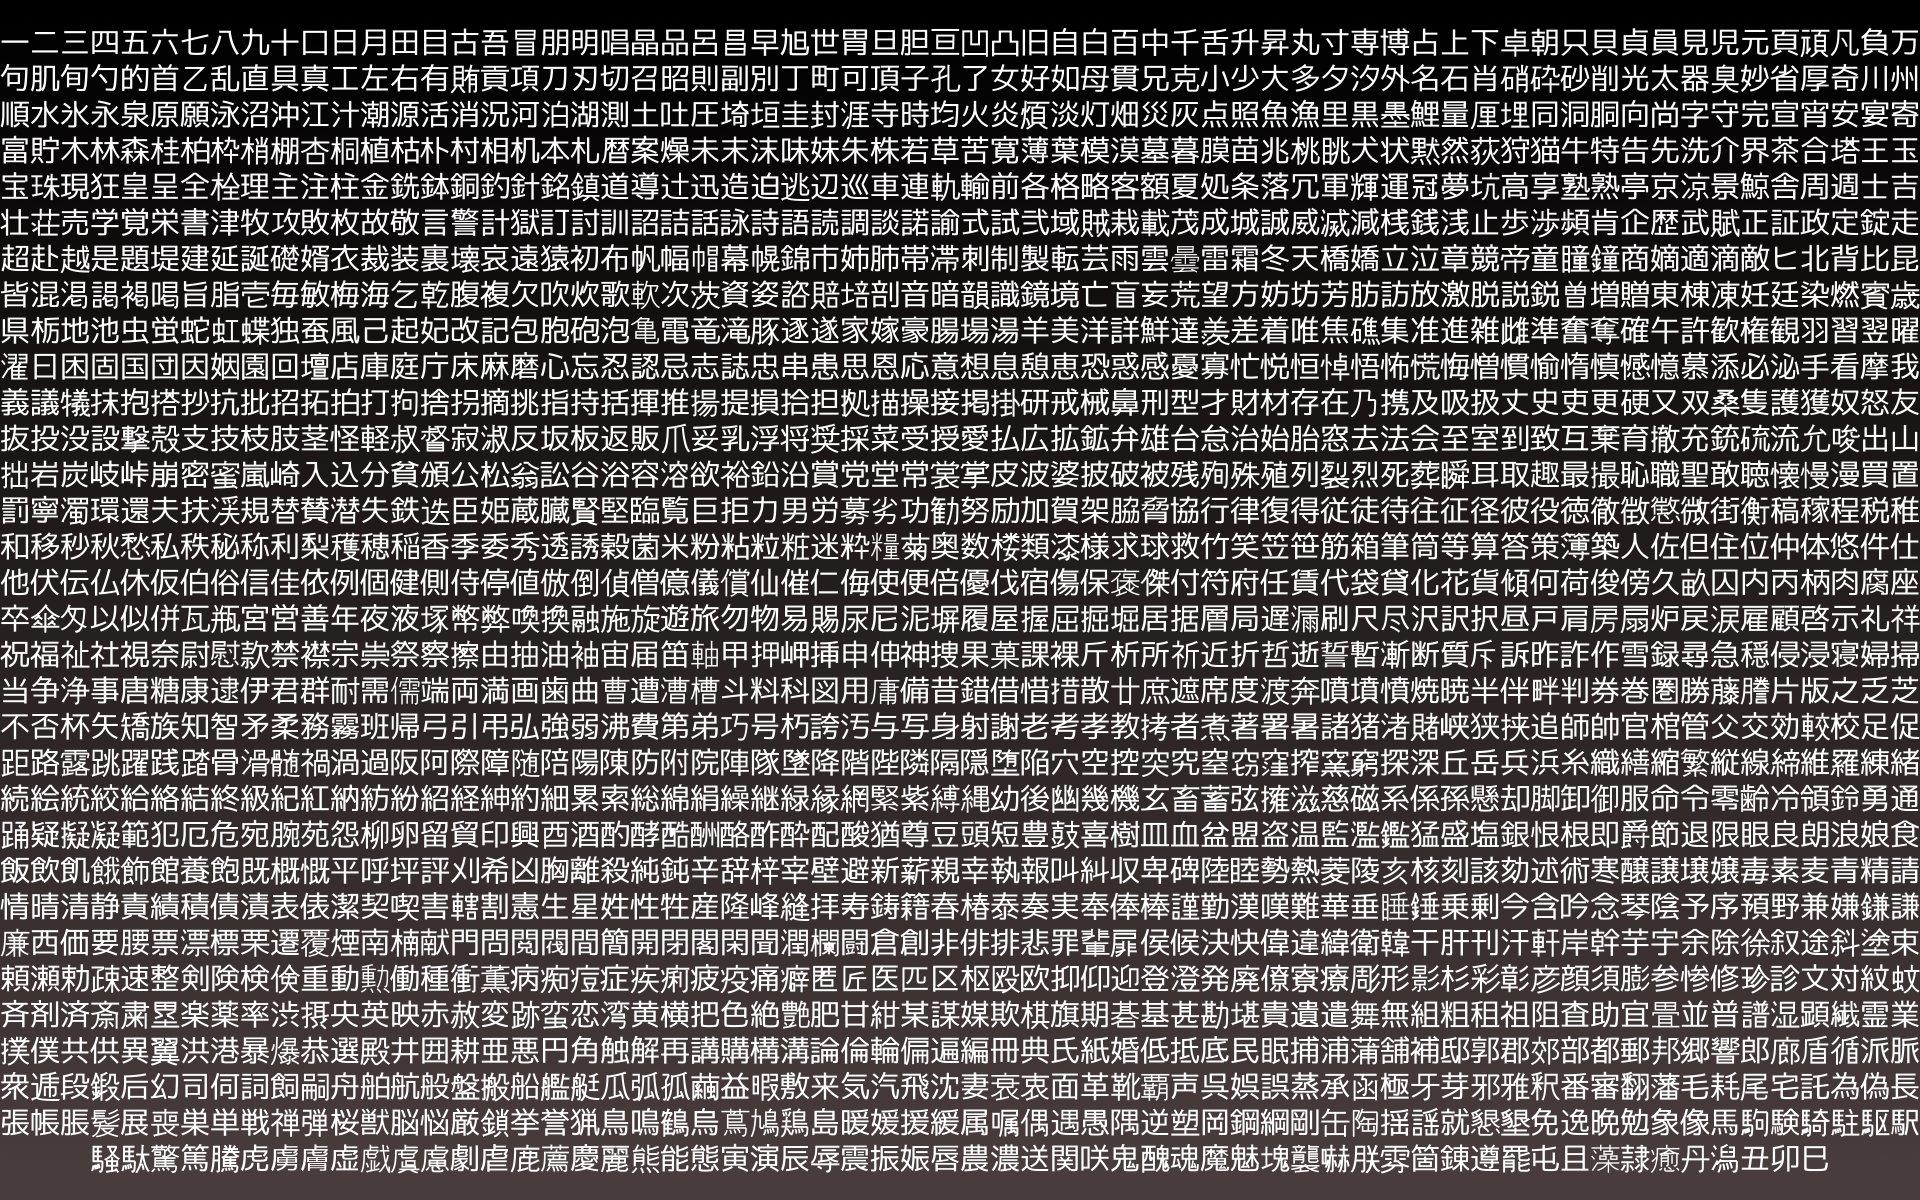 Wallpaper : wall, text, pattern, texture, circle, Japanese